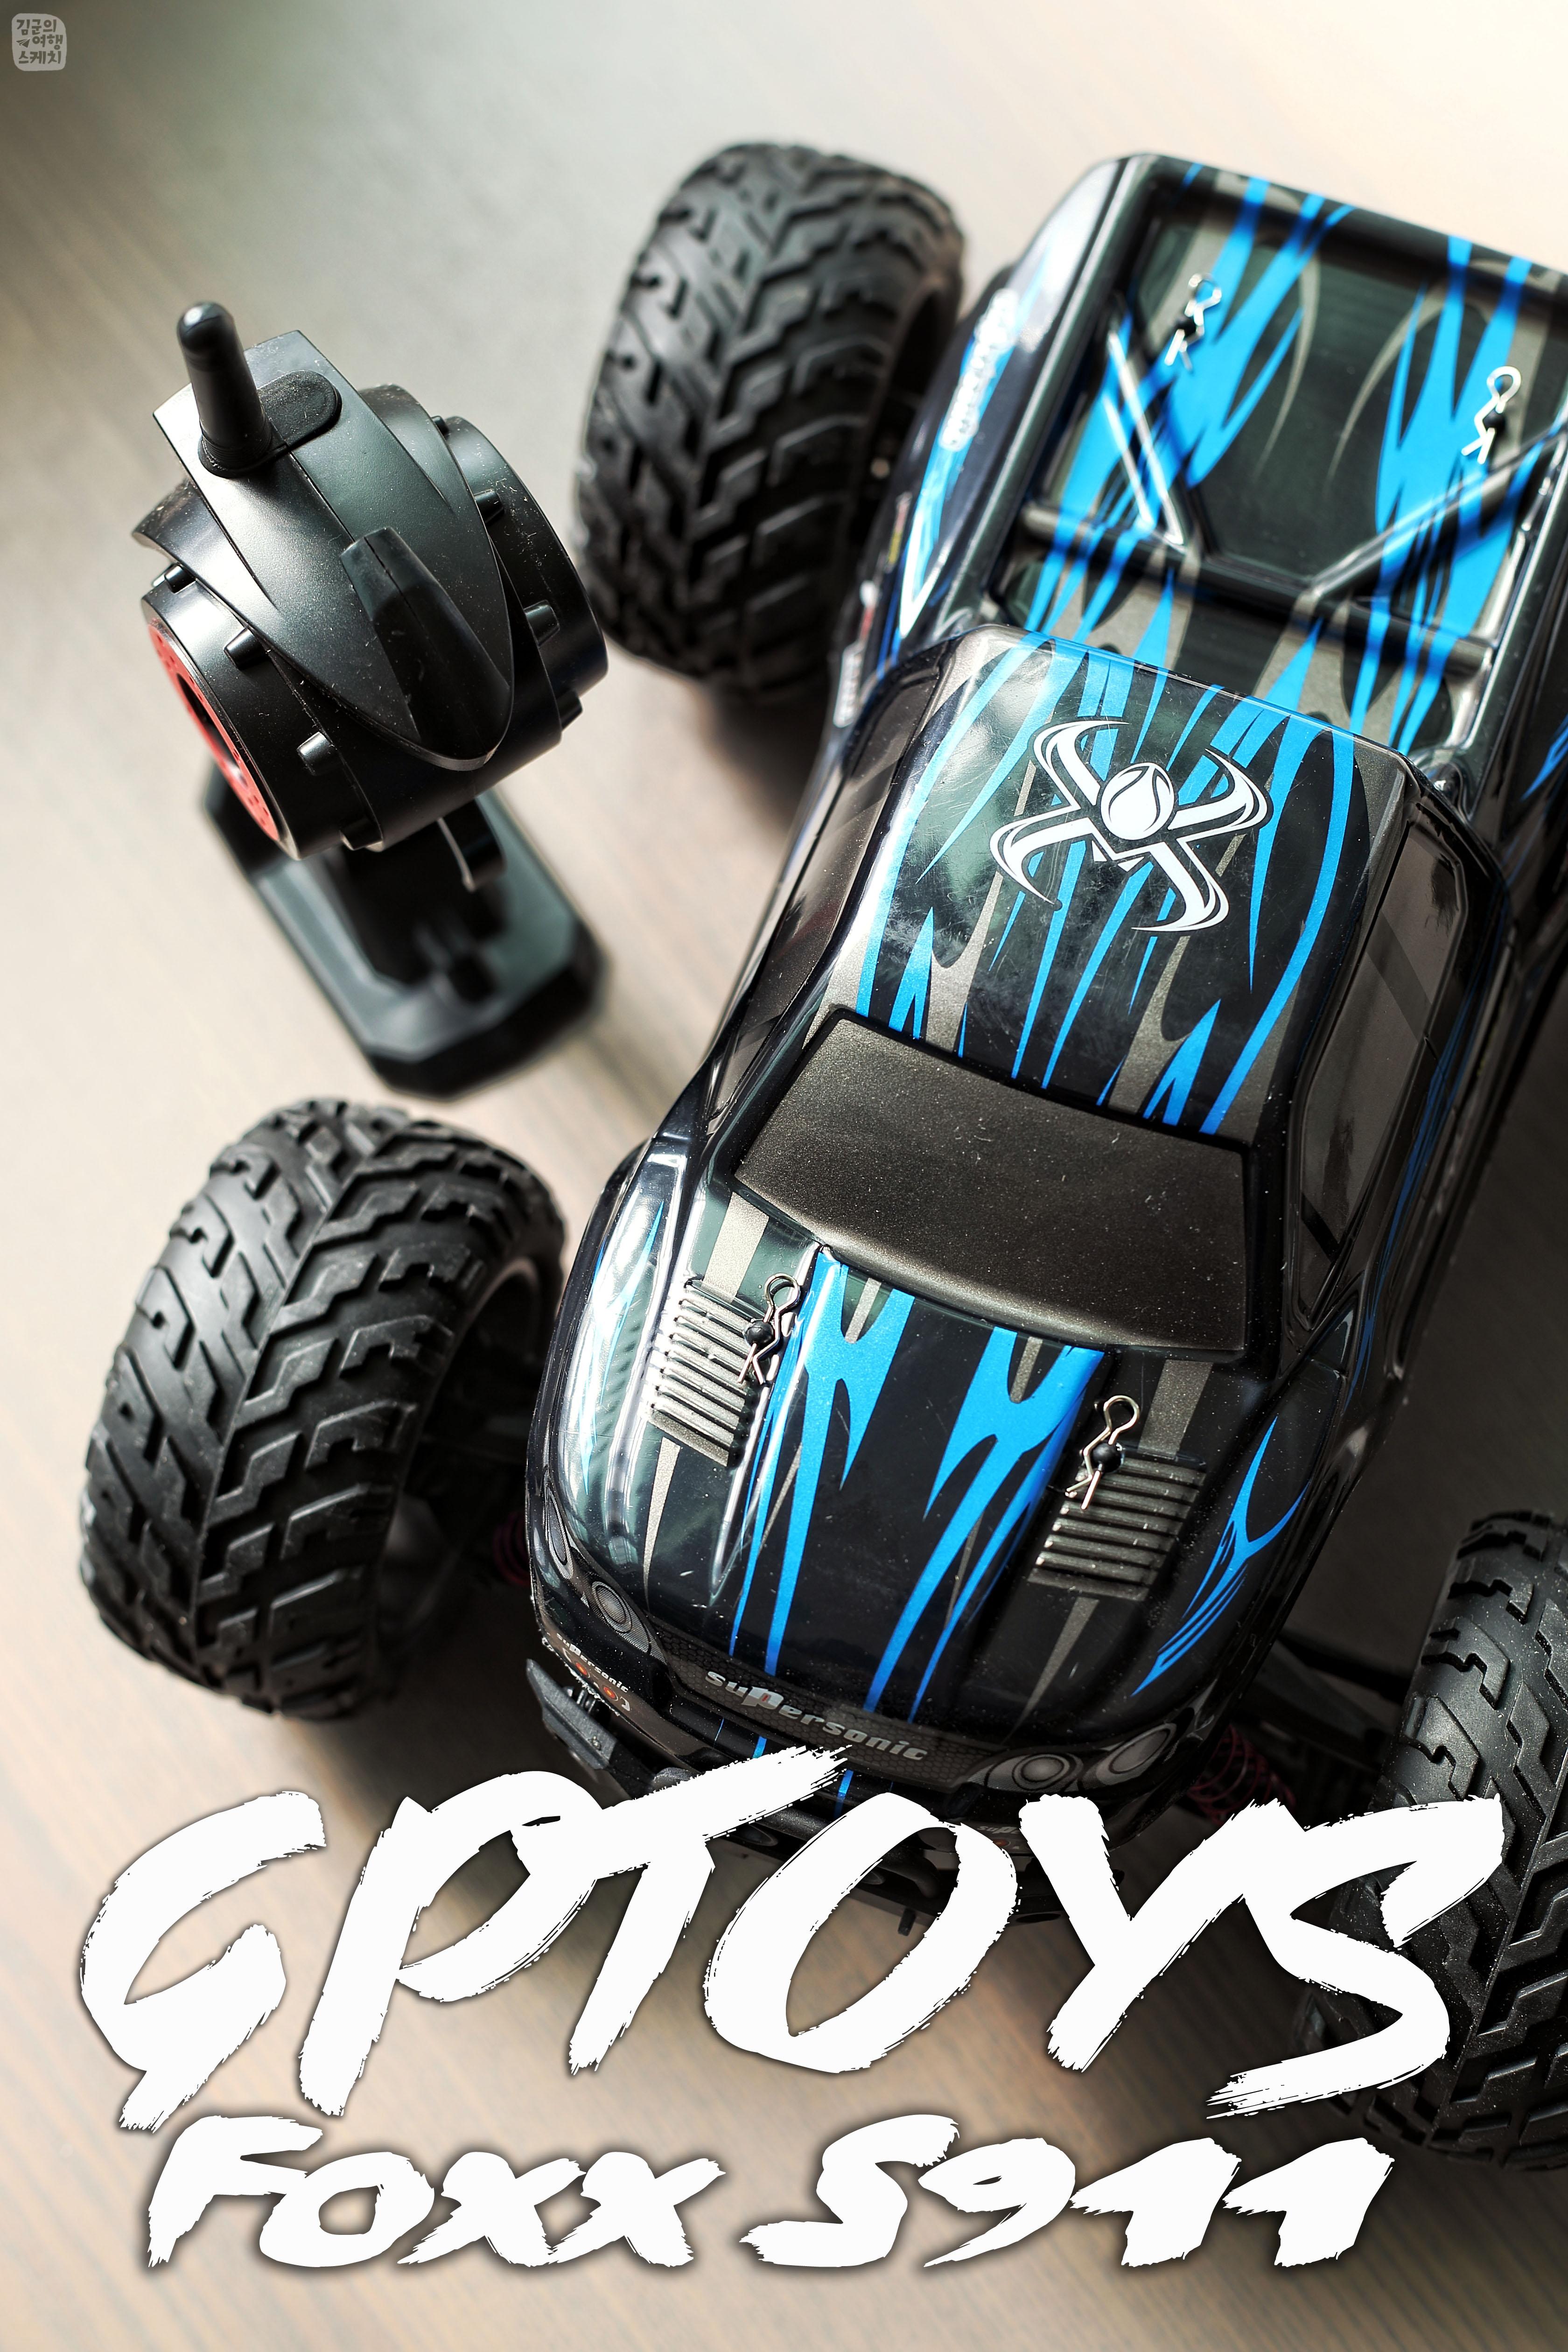 RC카 추천! 힘 좋은 어른 장난감! 몬스터트럭(GPTOYS Foxx S911) 표지1.jpg